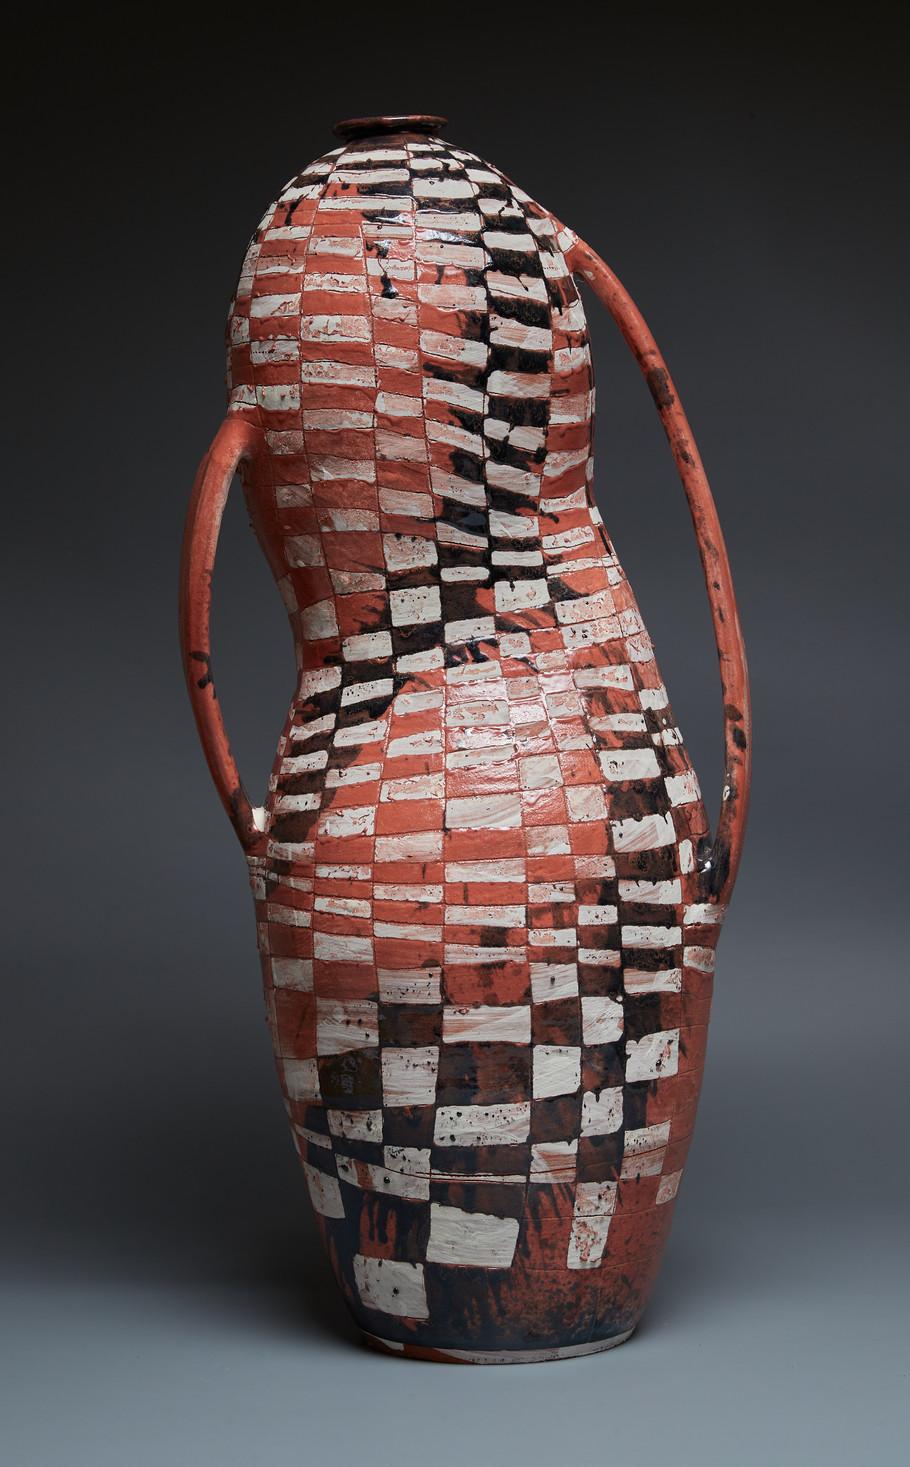 Maia McDonald (surface treatment) + Thomas Baker (thrown clay body)